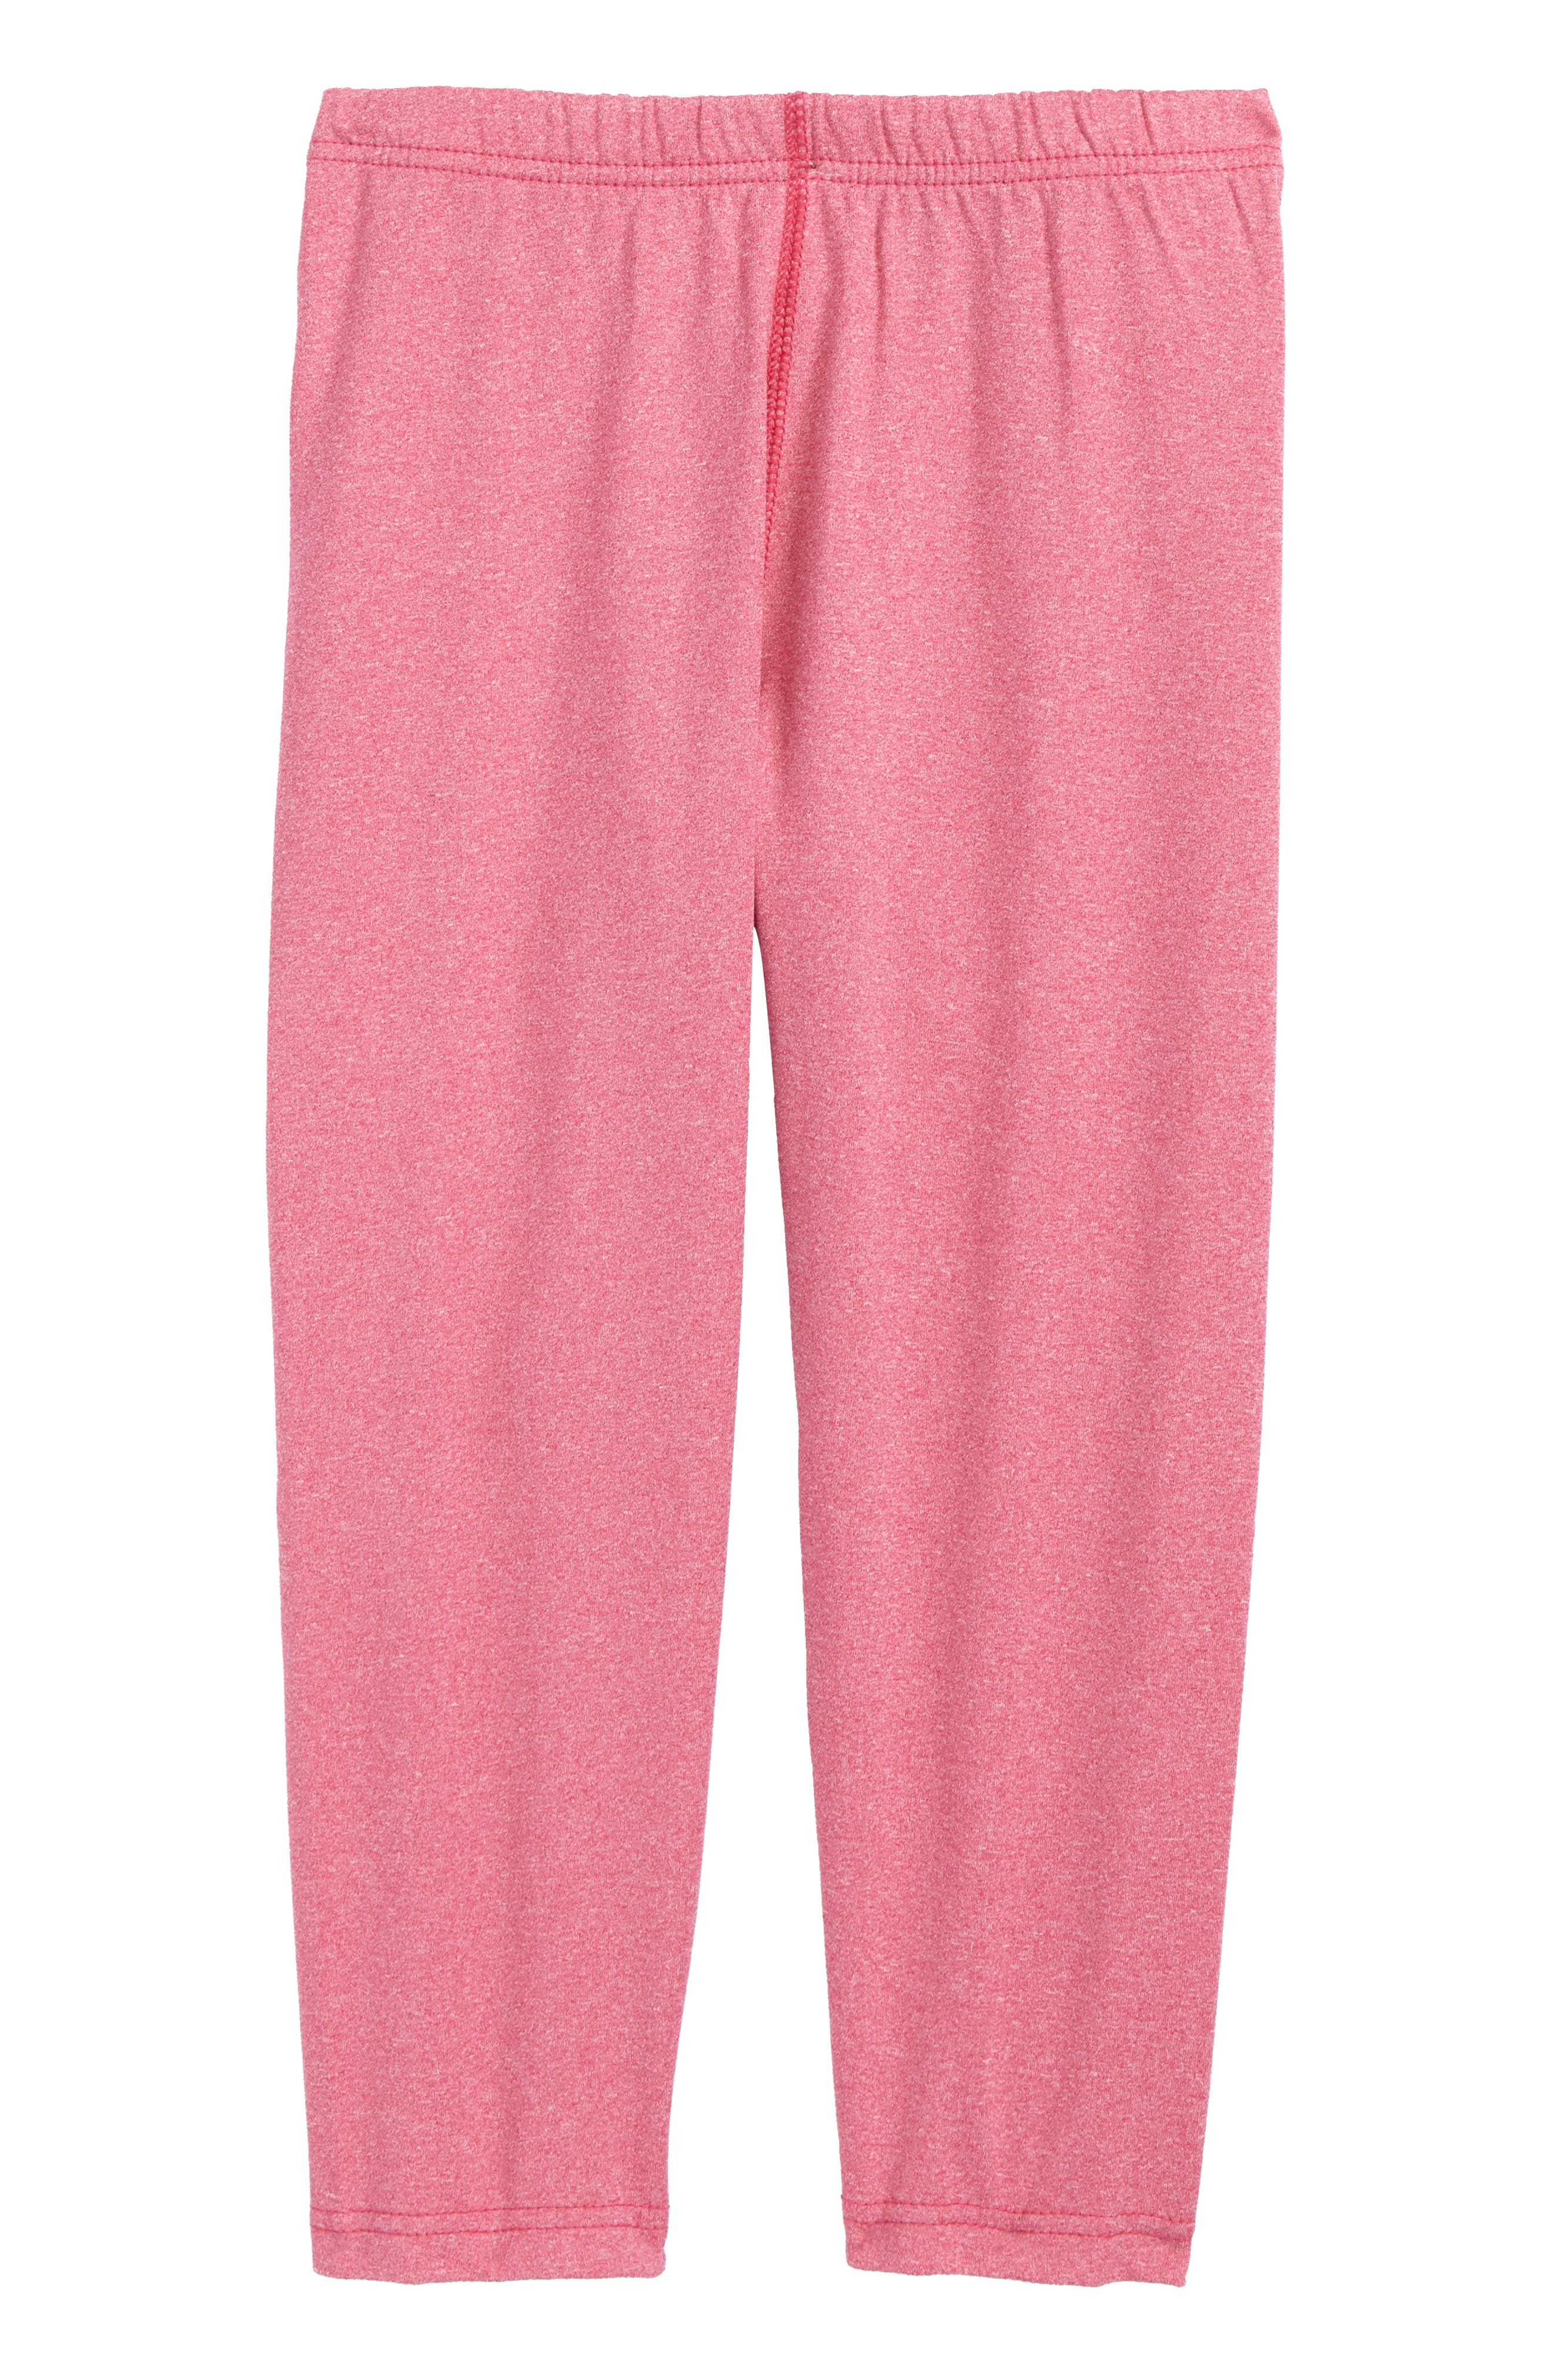 'Micro D<sup>®</sup>' Fleece Pants,                         Main,                         color, Craft Pink